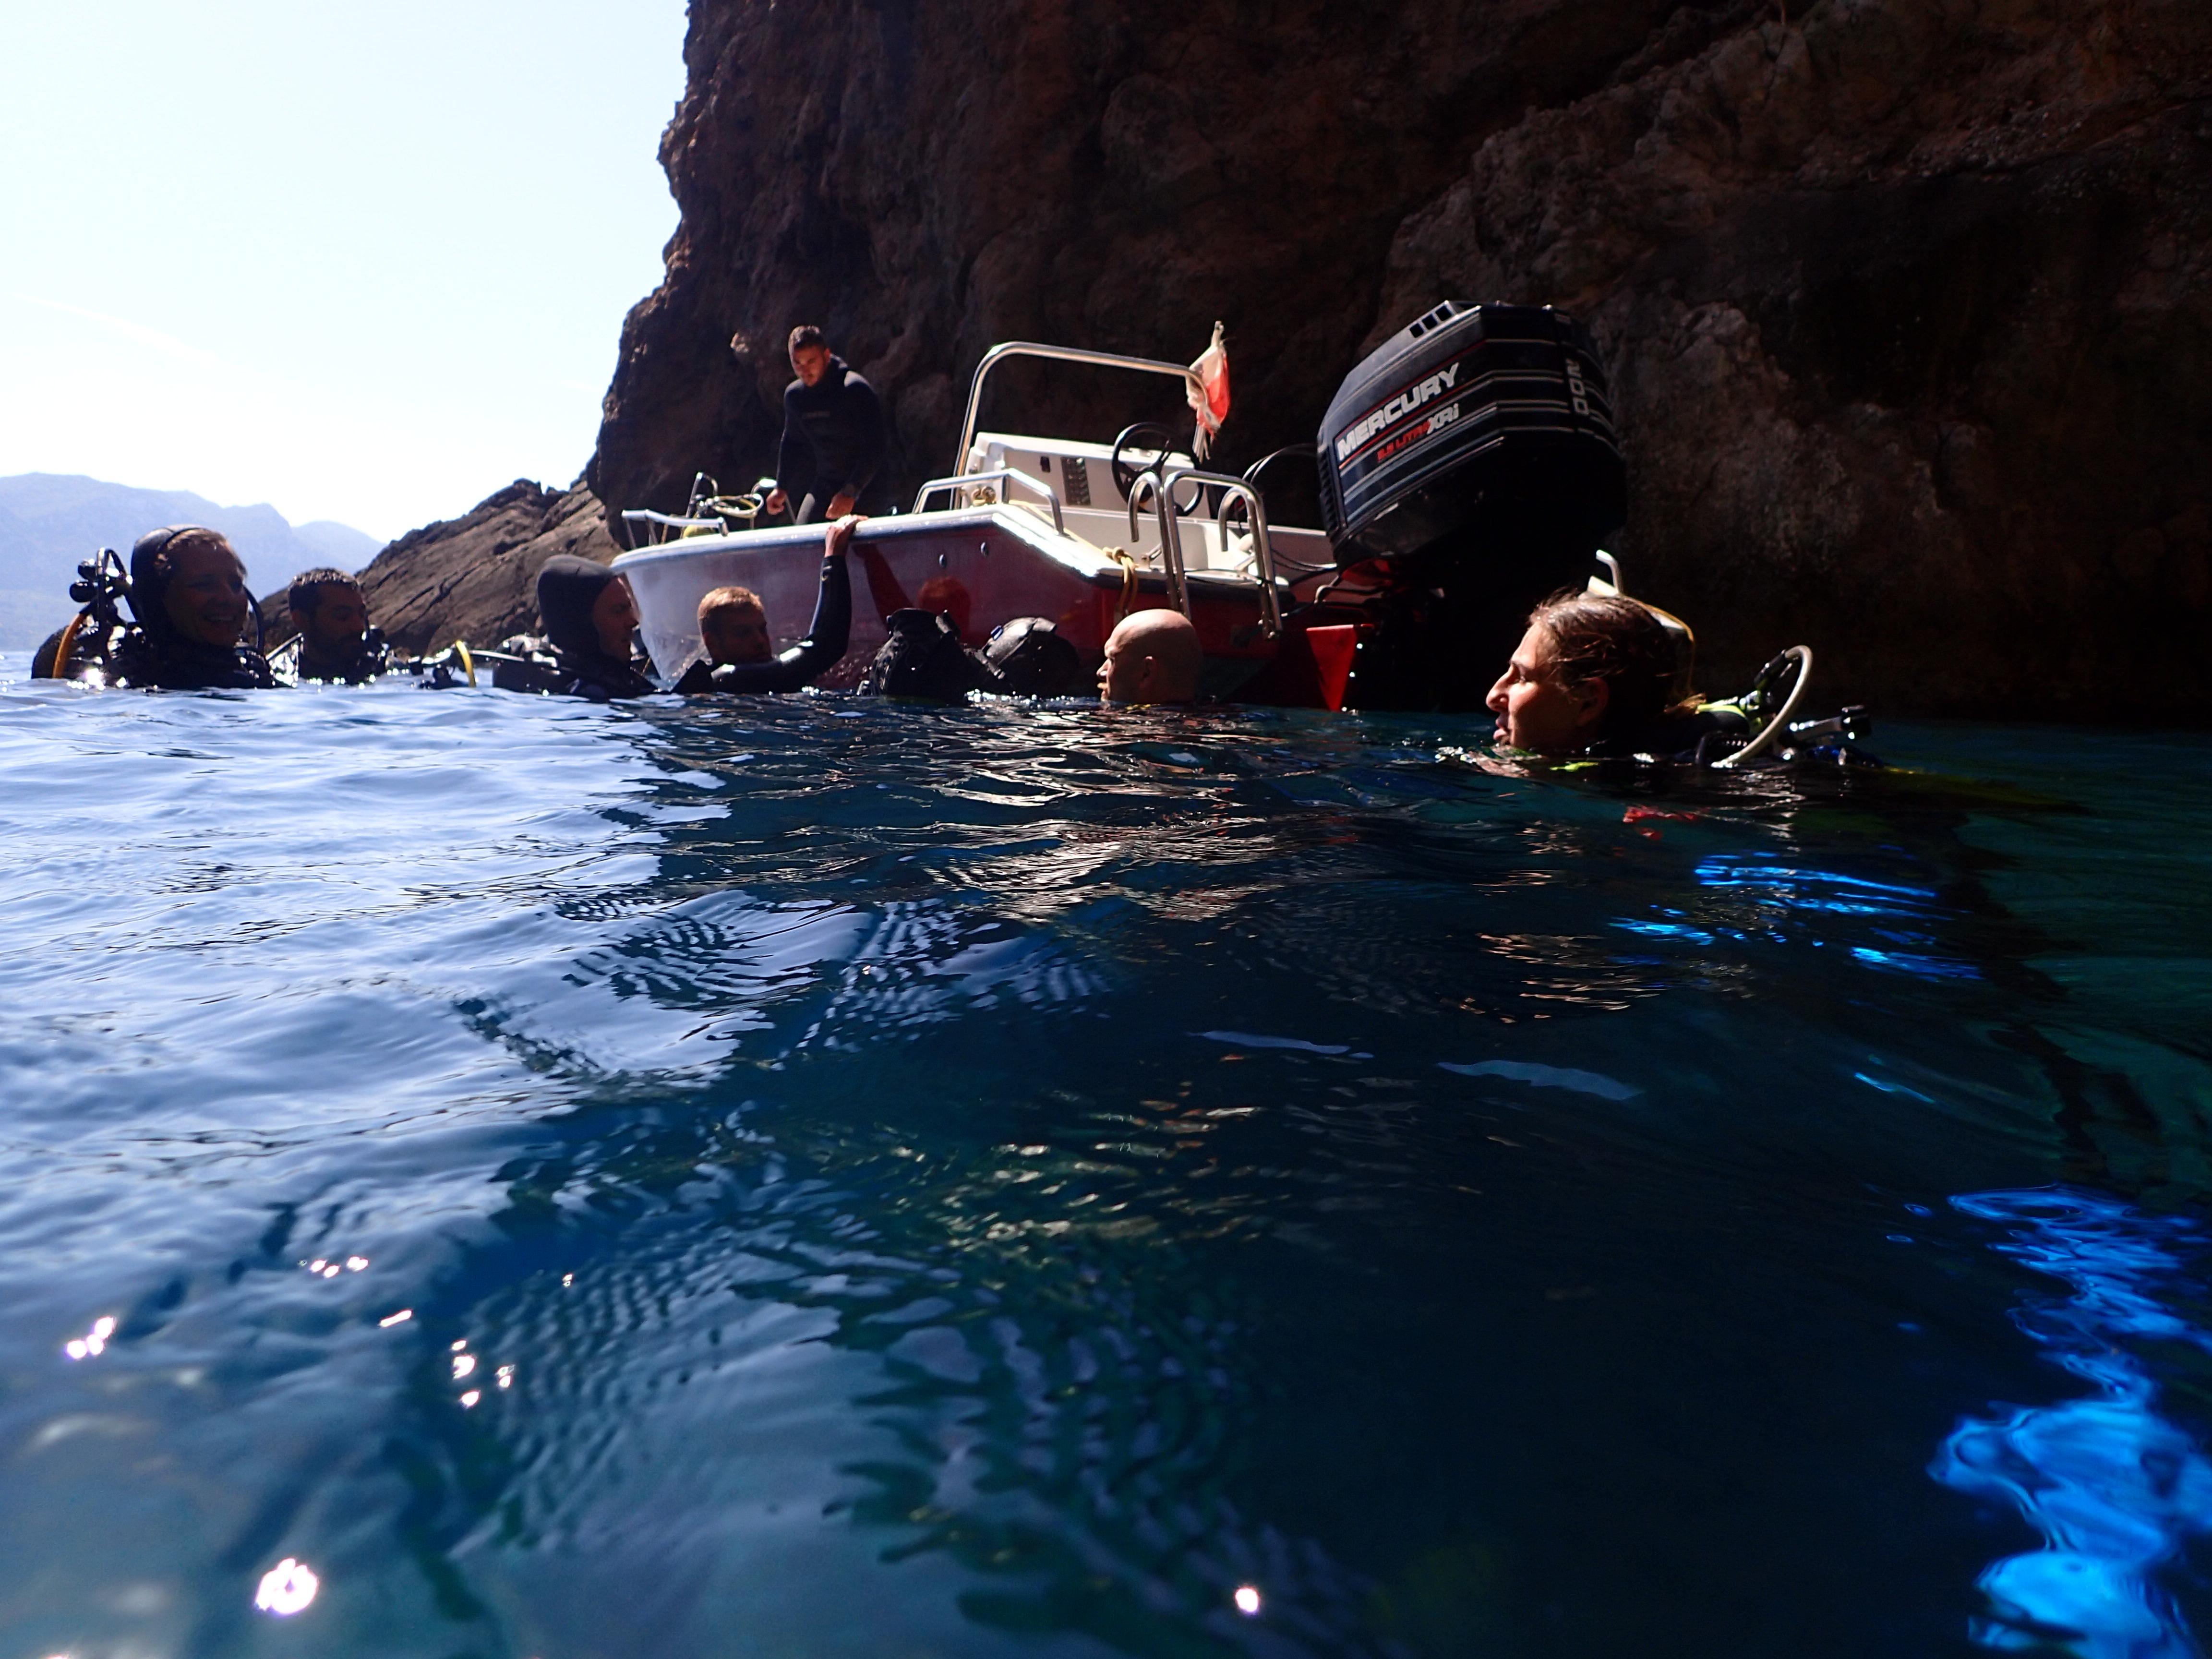 Athens Extreme Sports - Boat tour